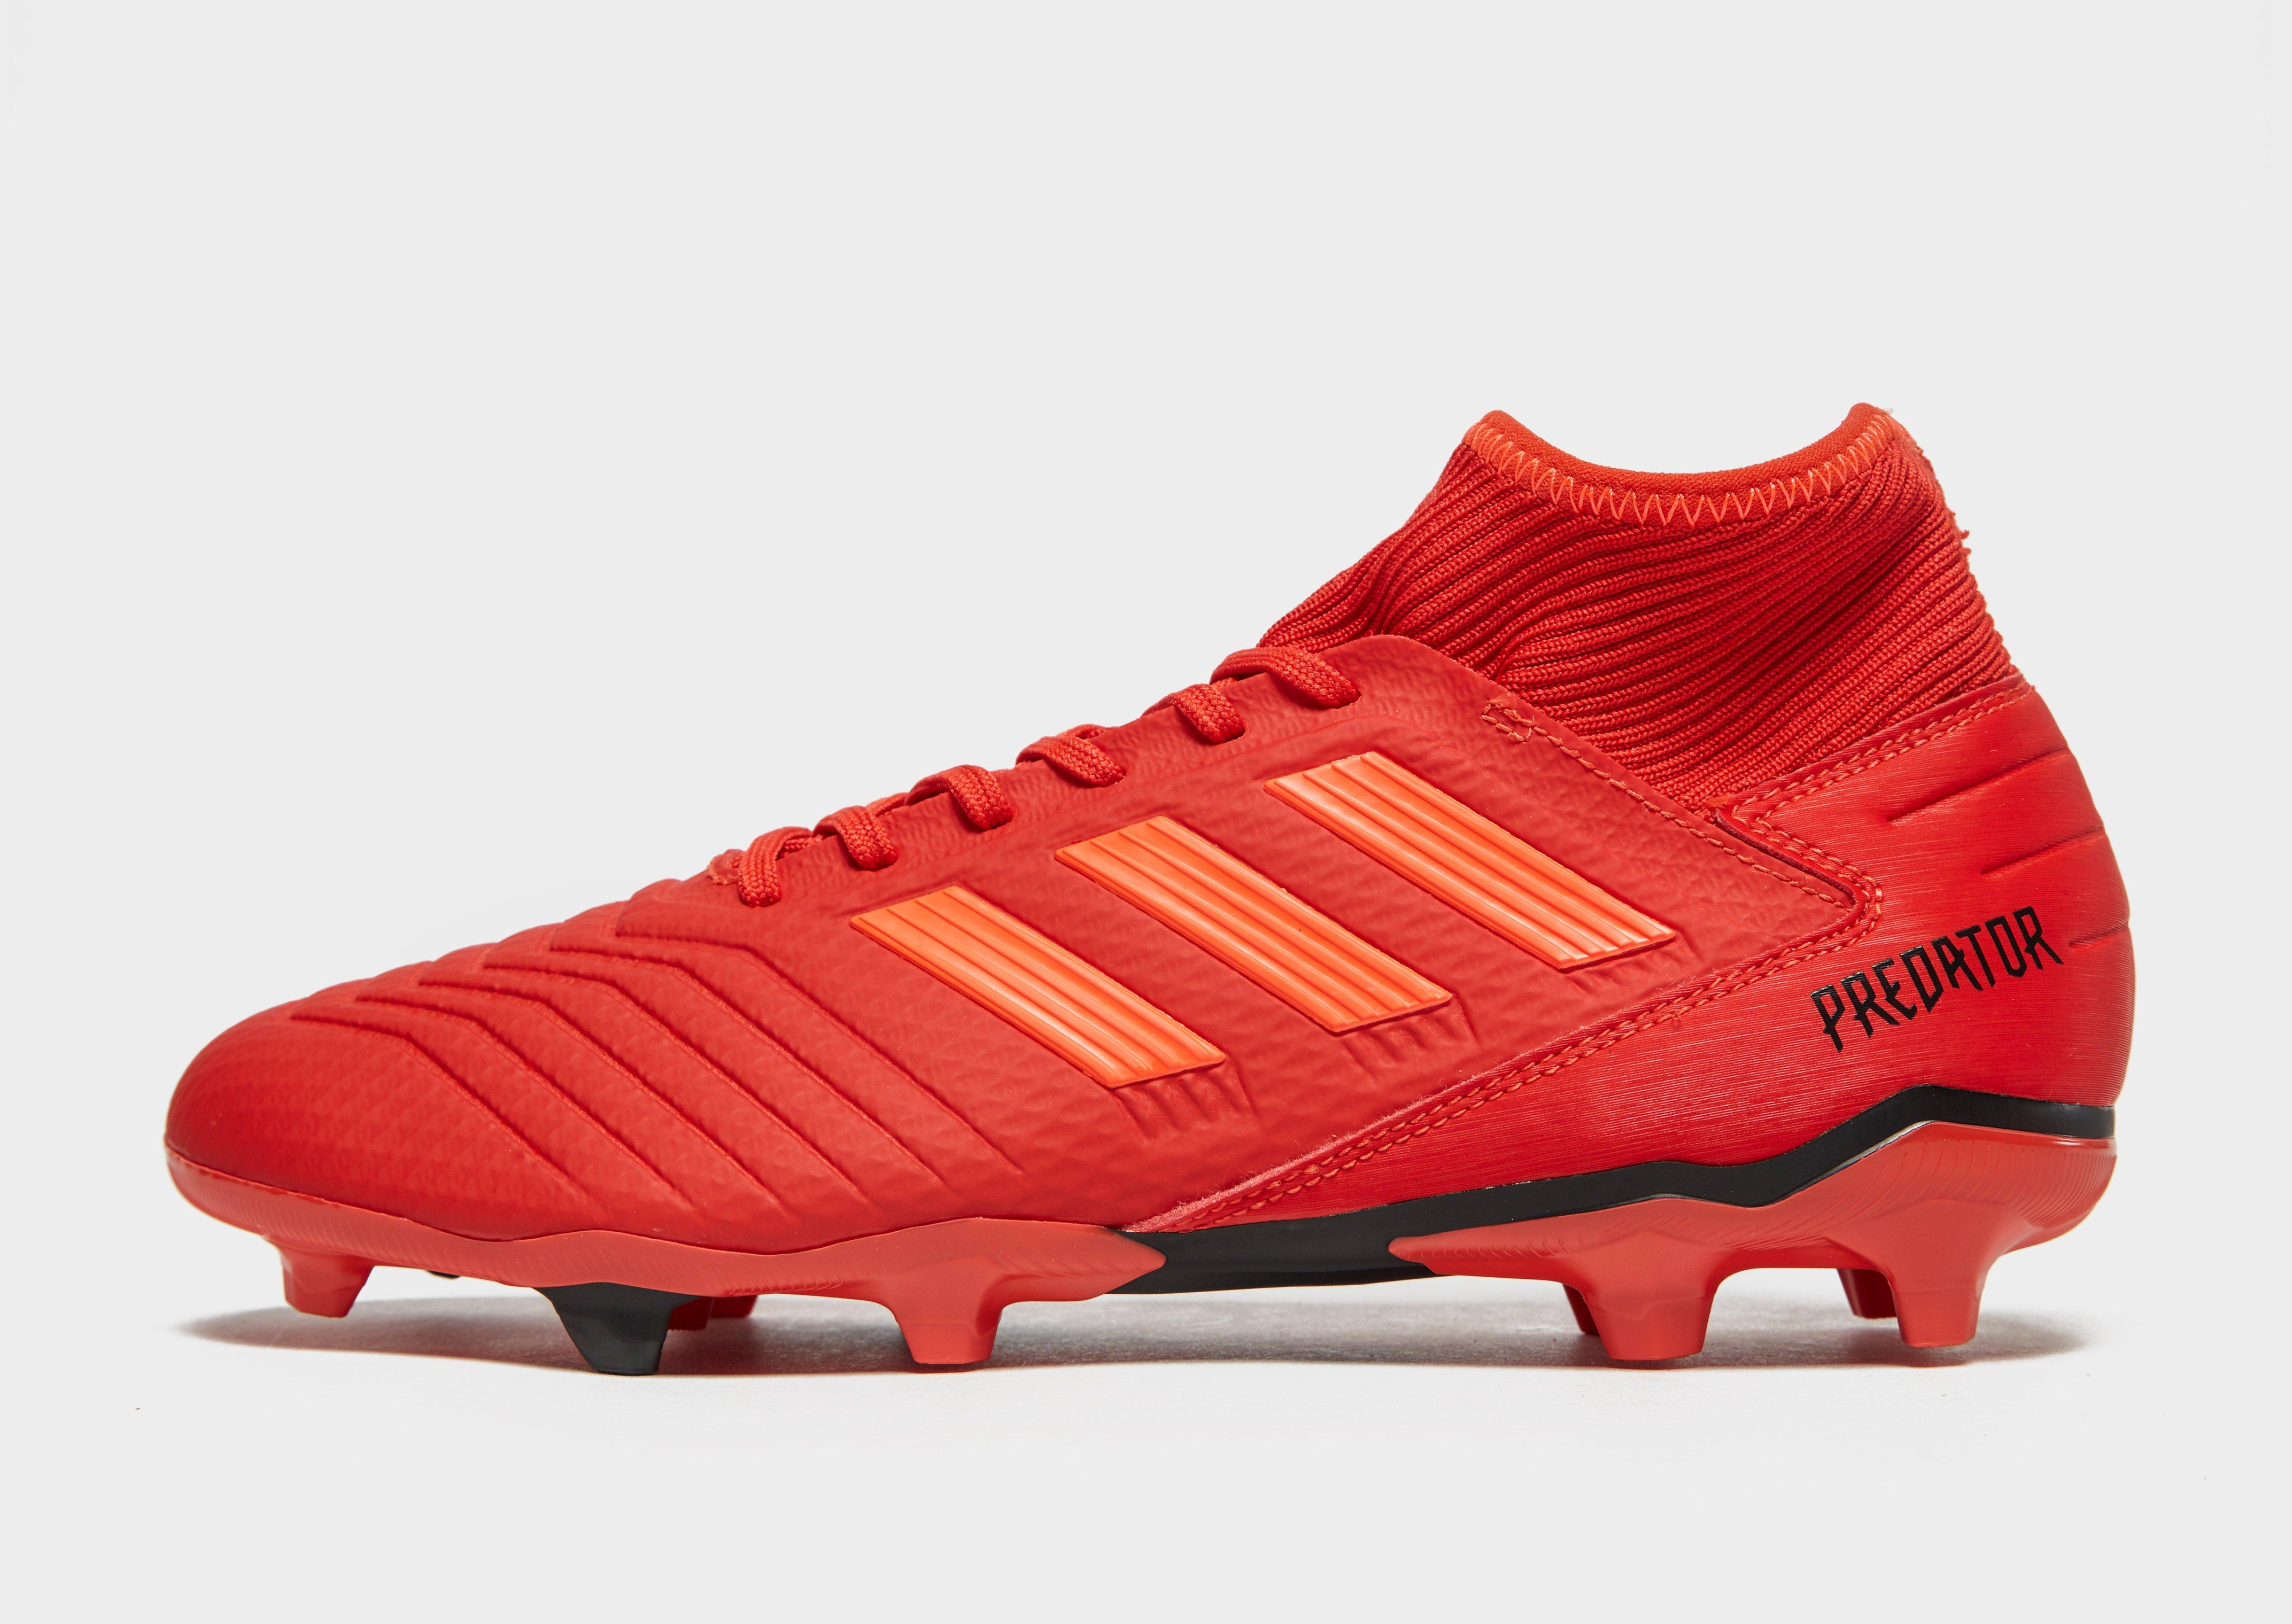 6660f87210b New adidas Initiator Predator 19.3 FG Football Boots Red